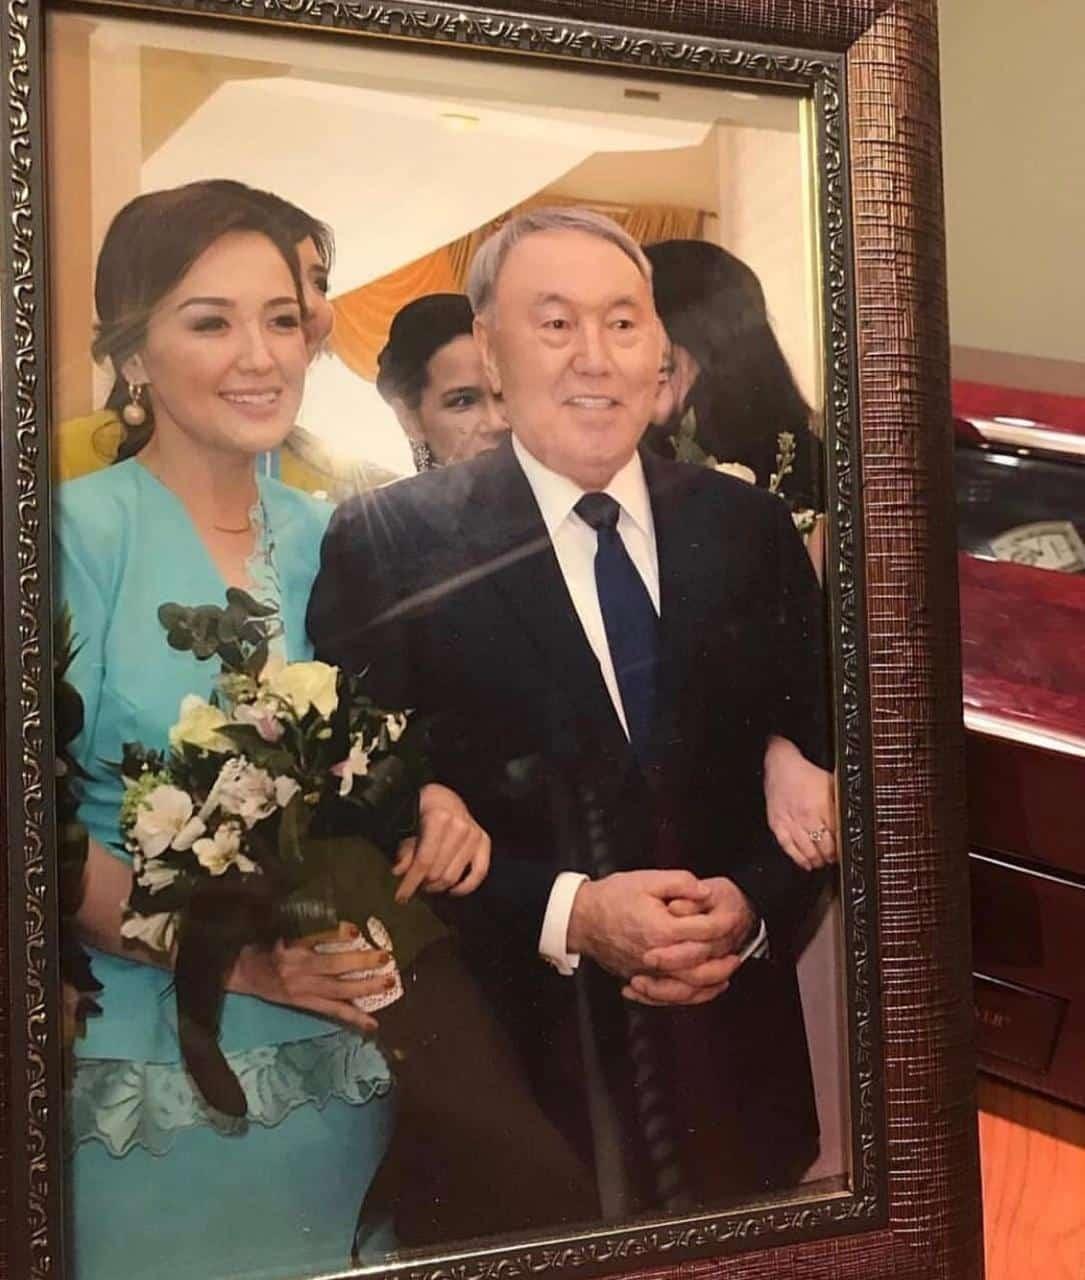 Ләйла Сұлтанқызы, Нұрсұлтан Назарбаев